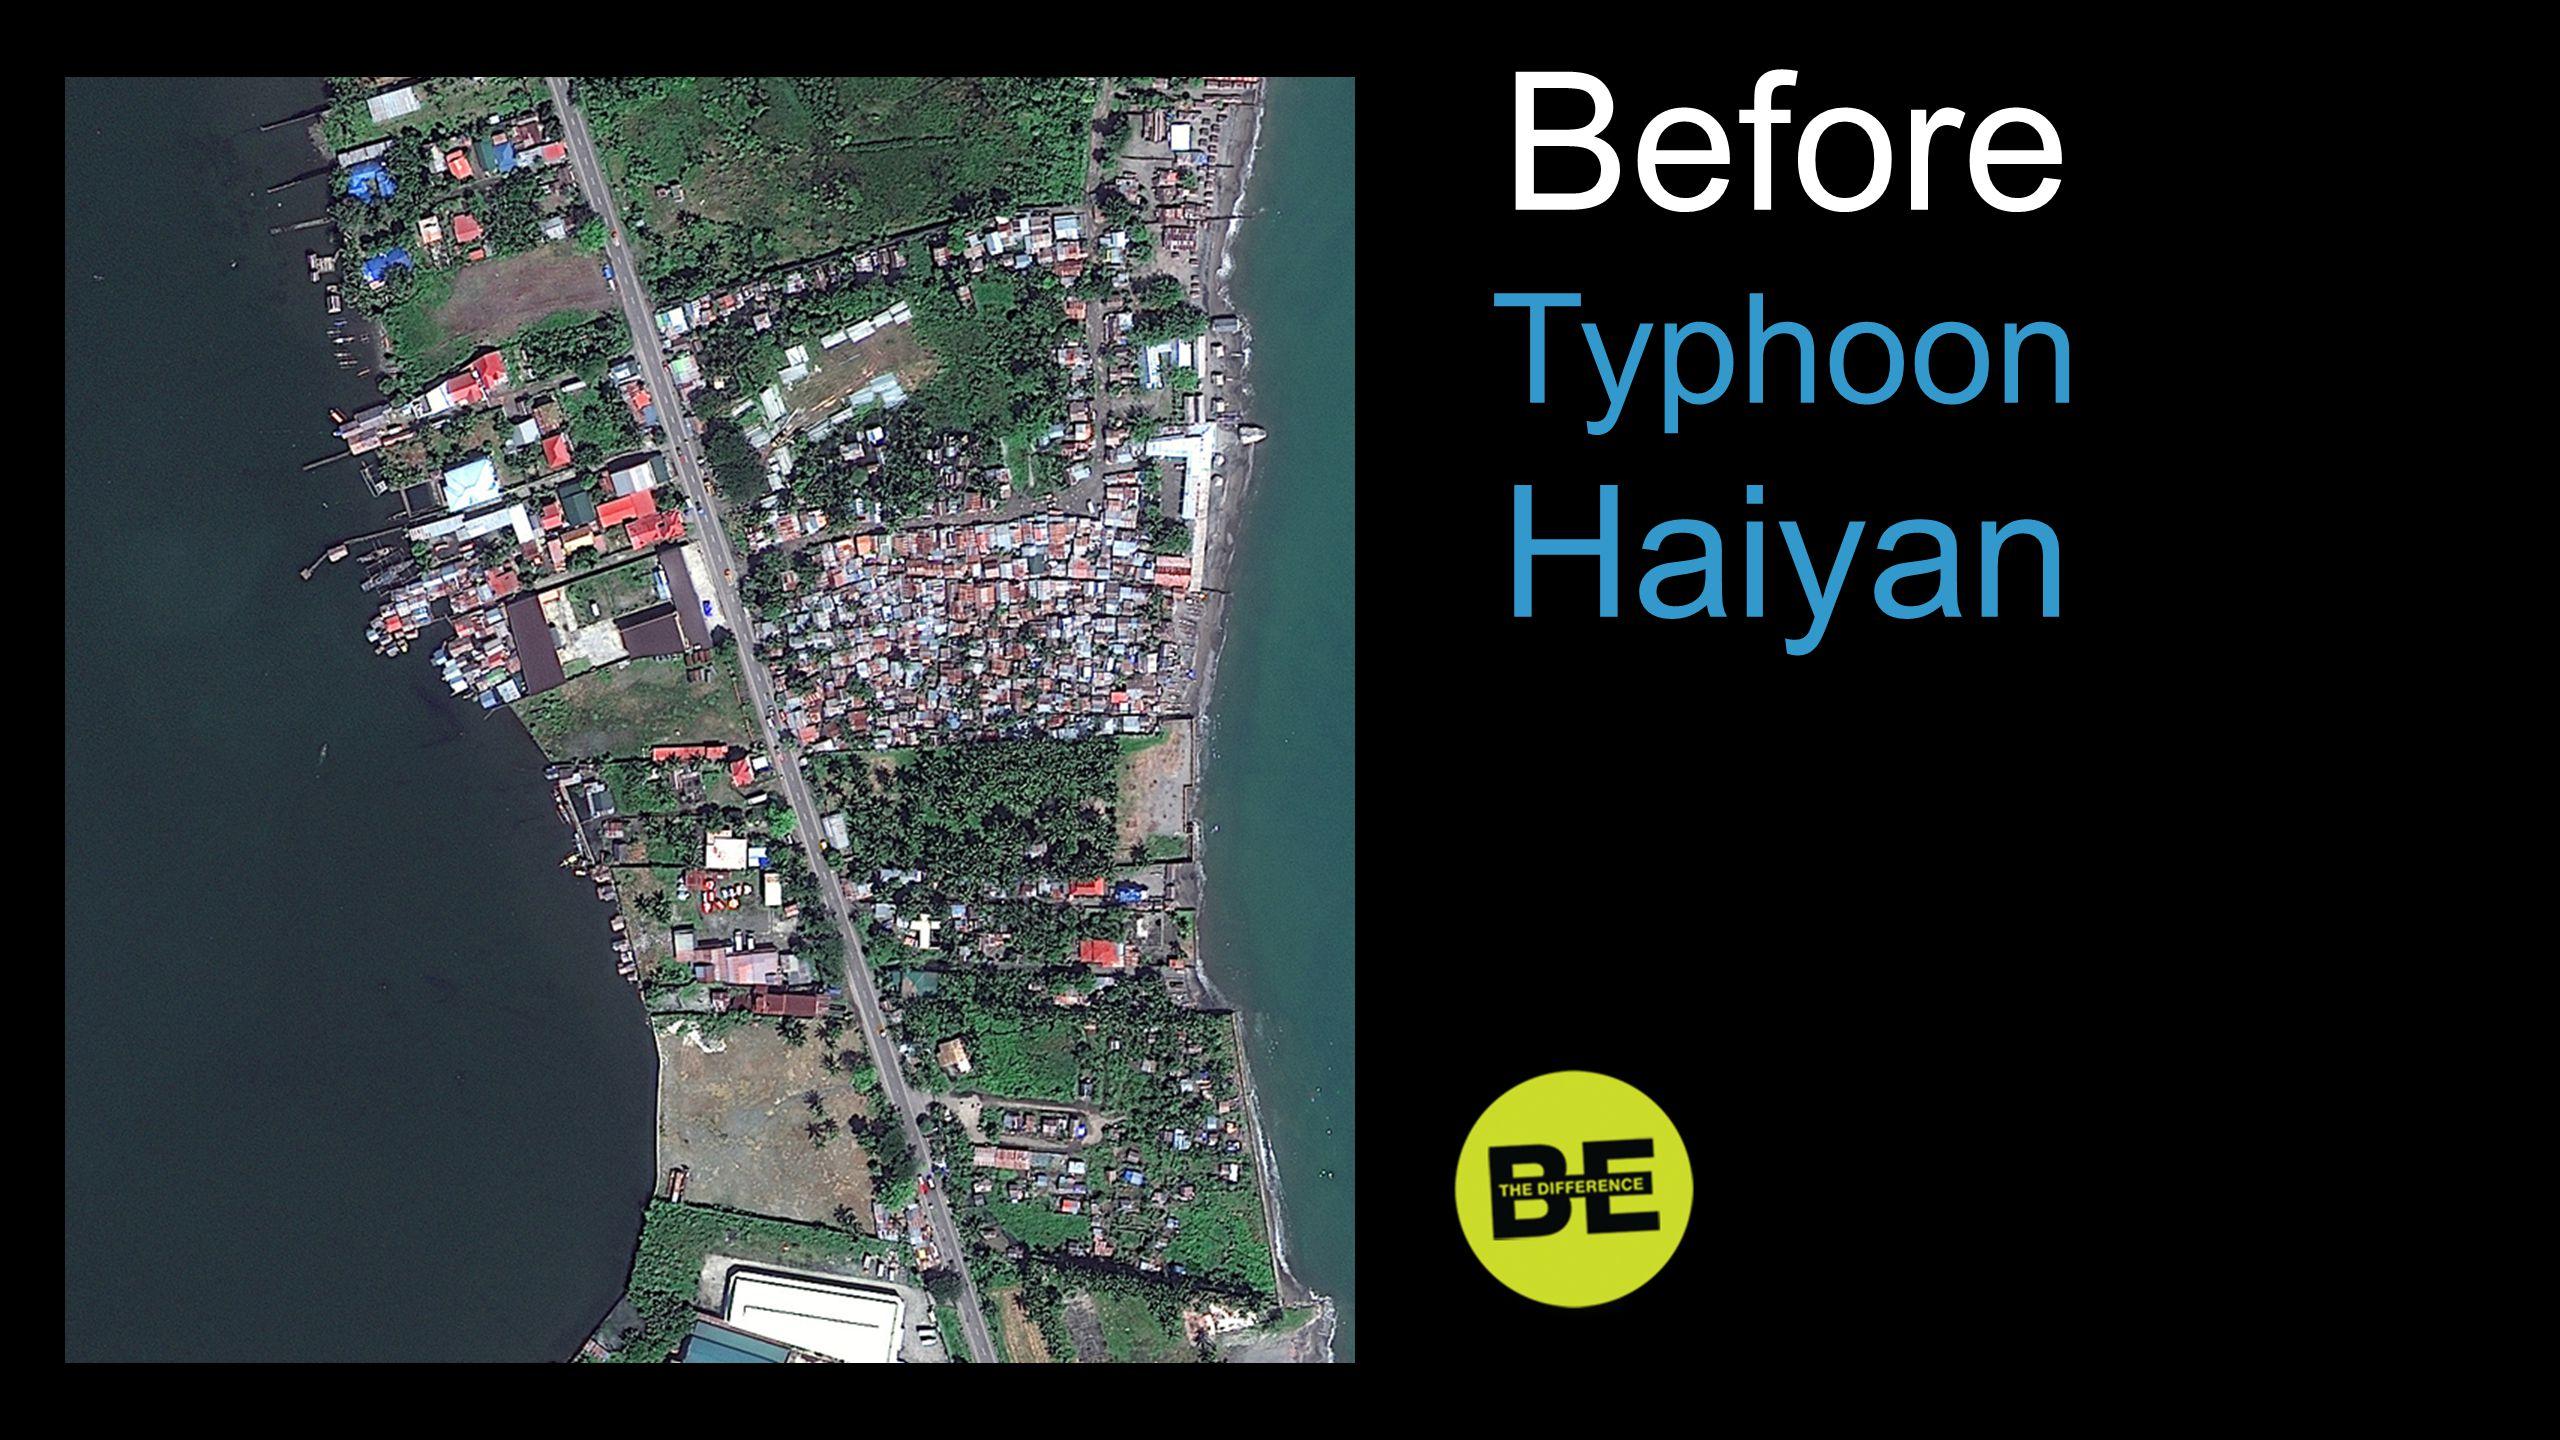 Before Typhoon Haiyan